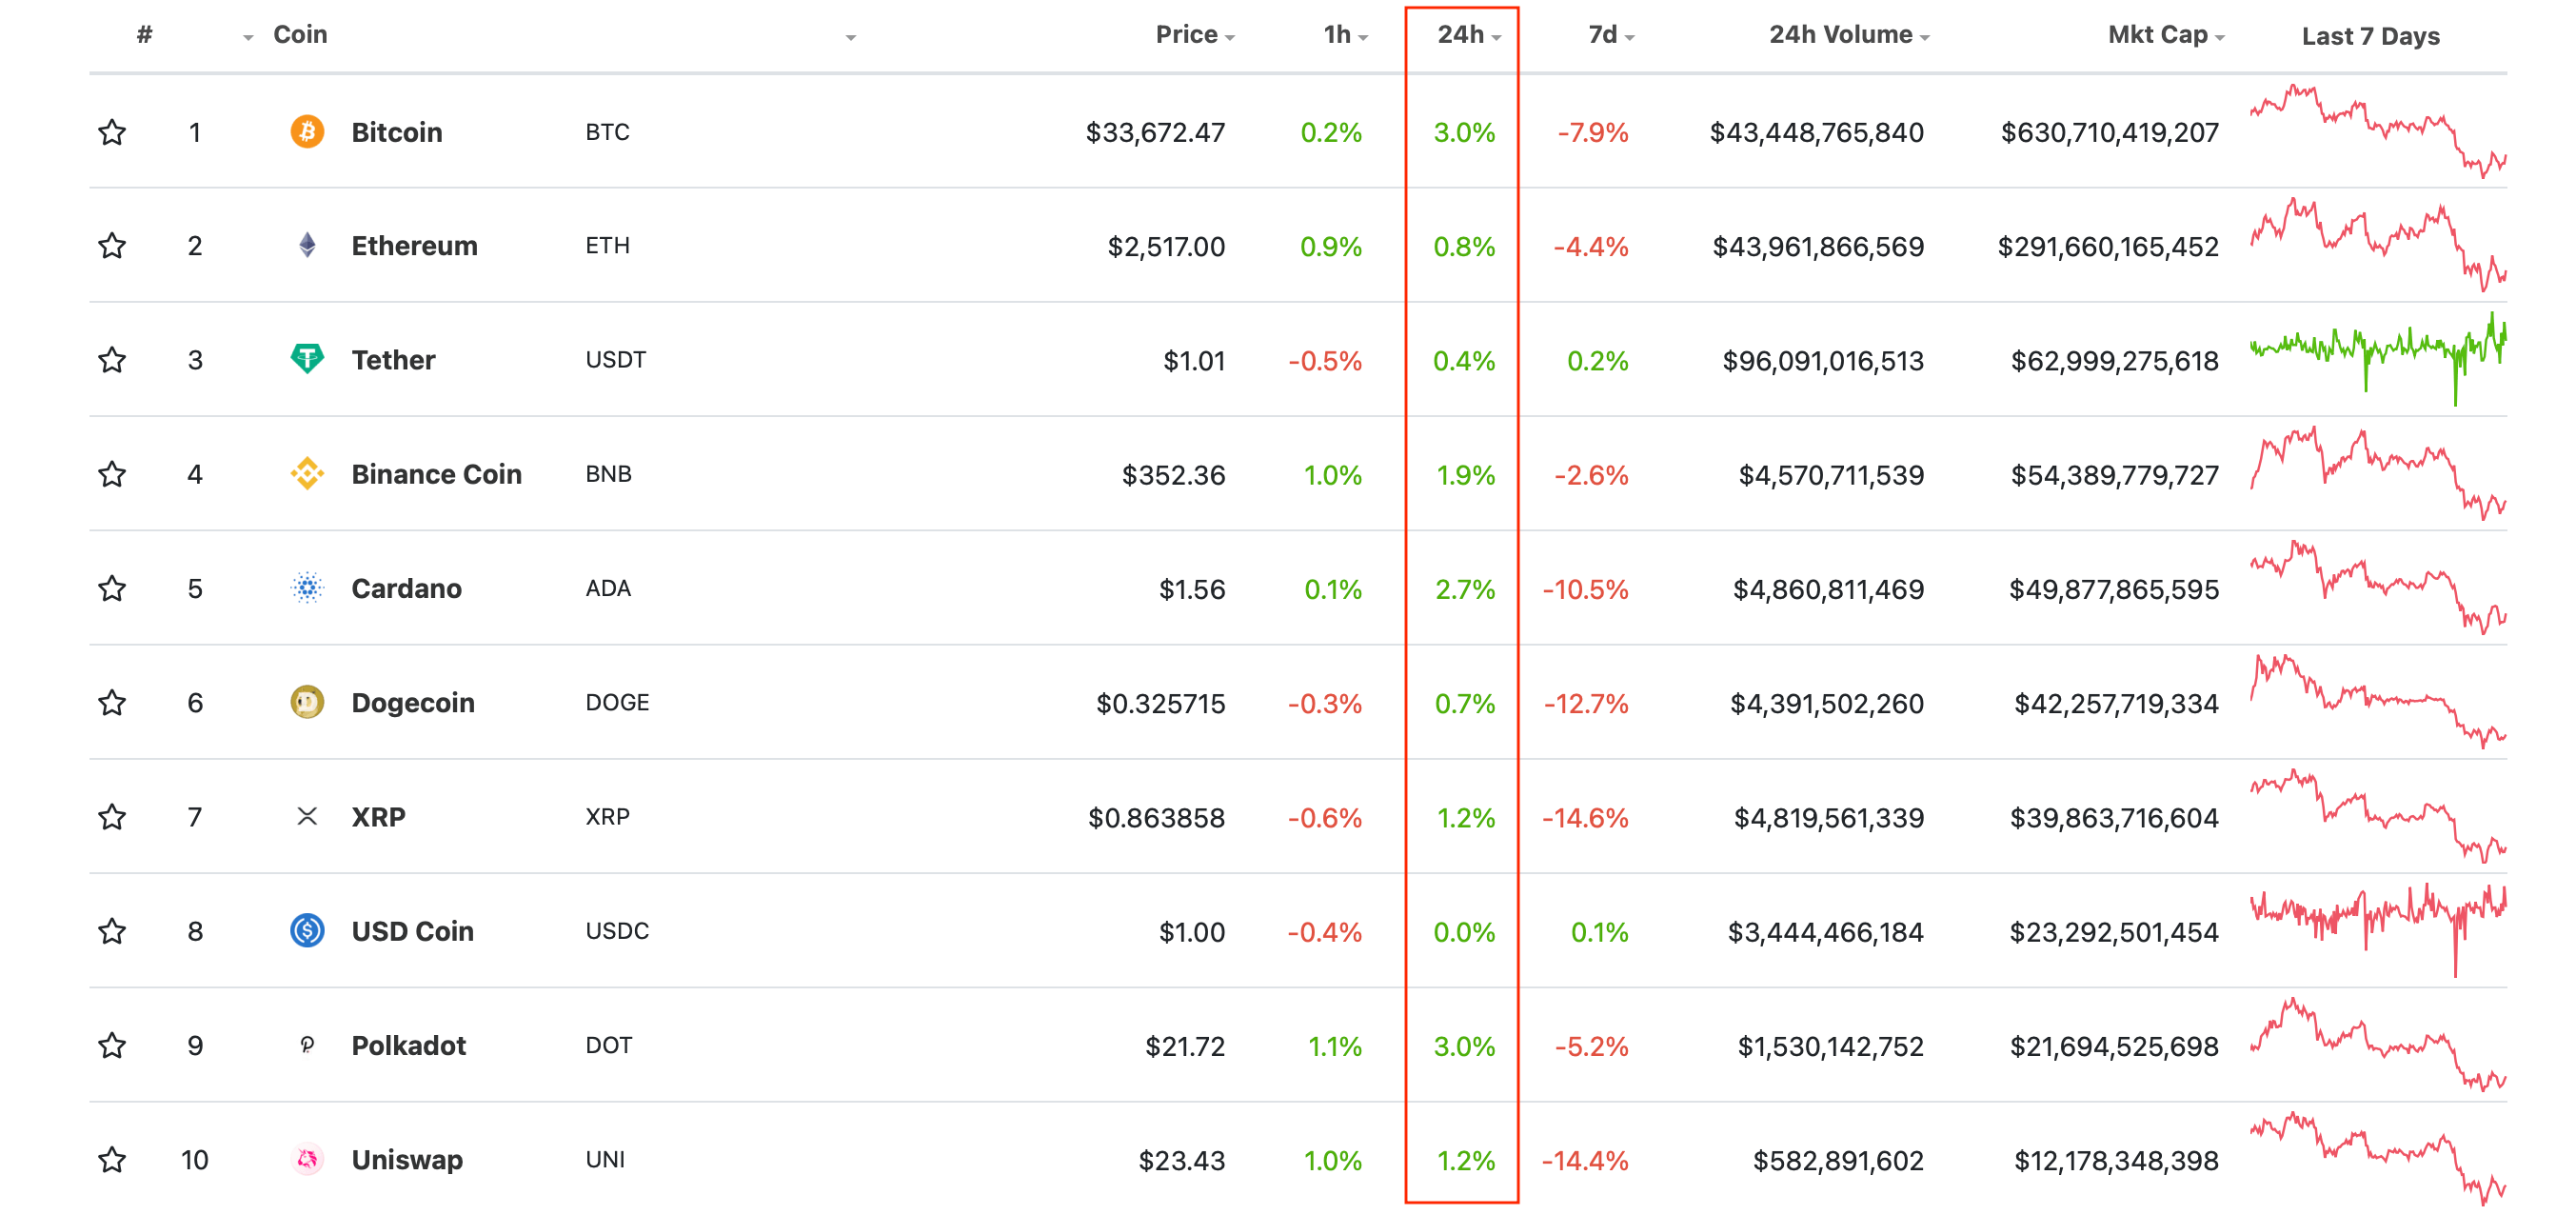 криптовалюты рейтинг биткоин